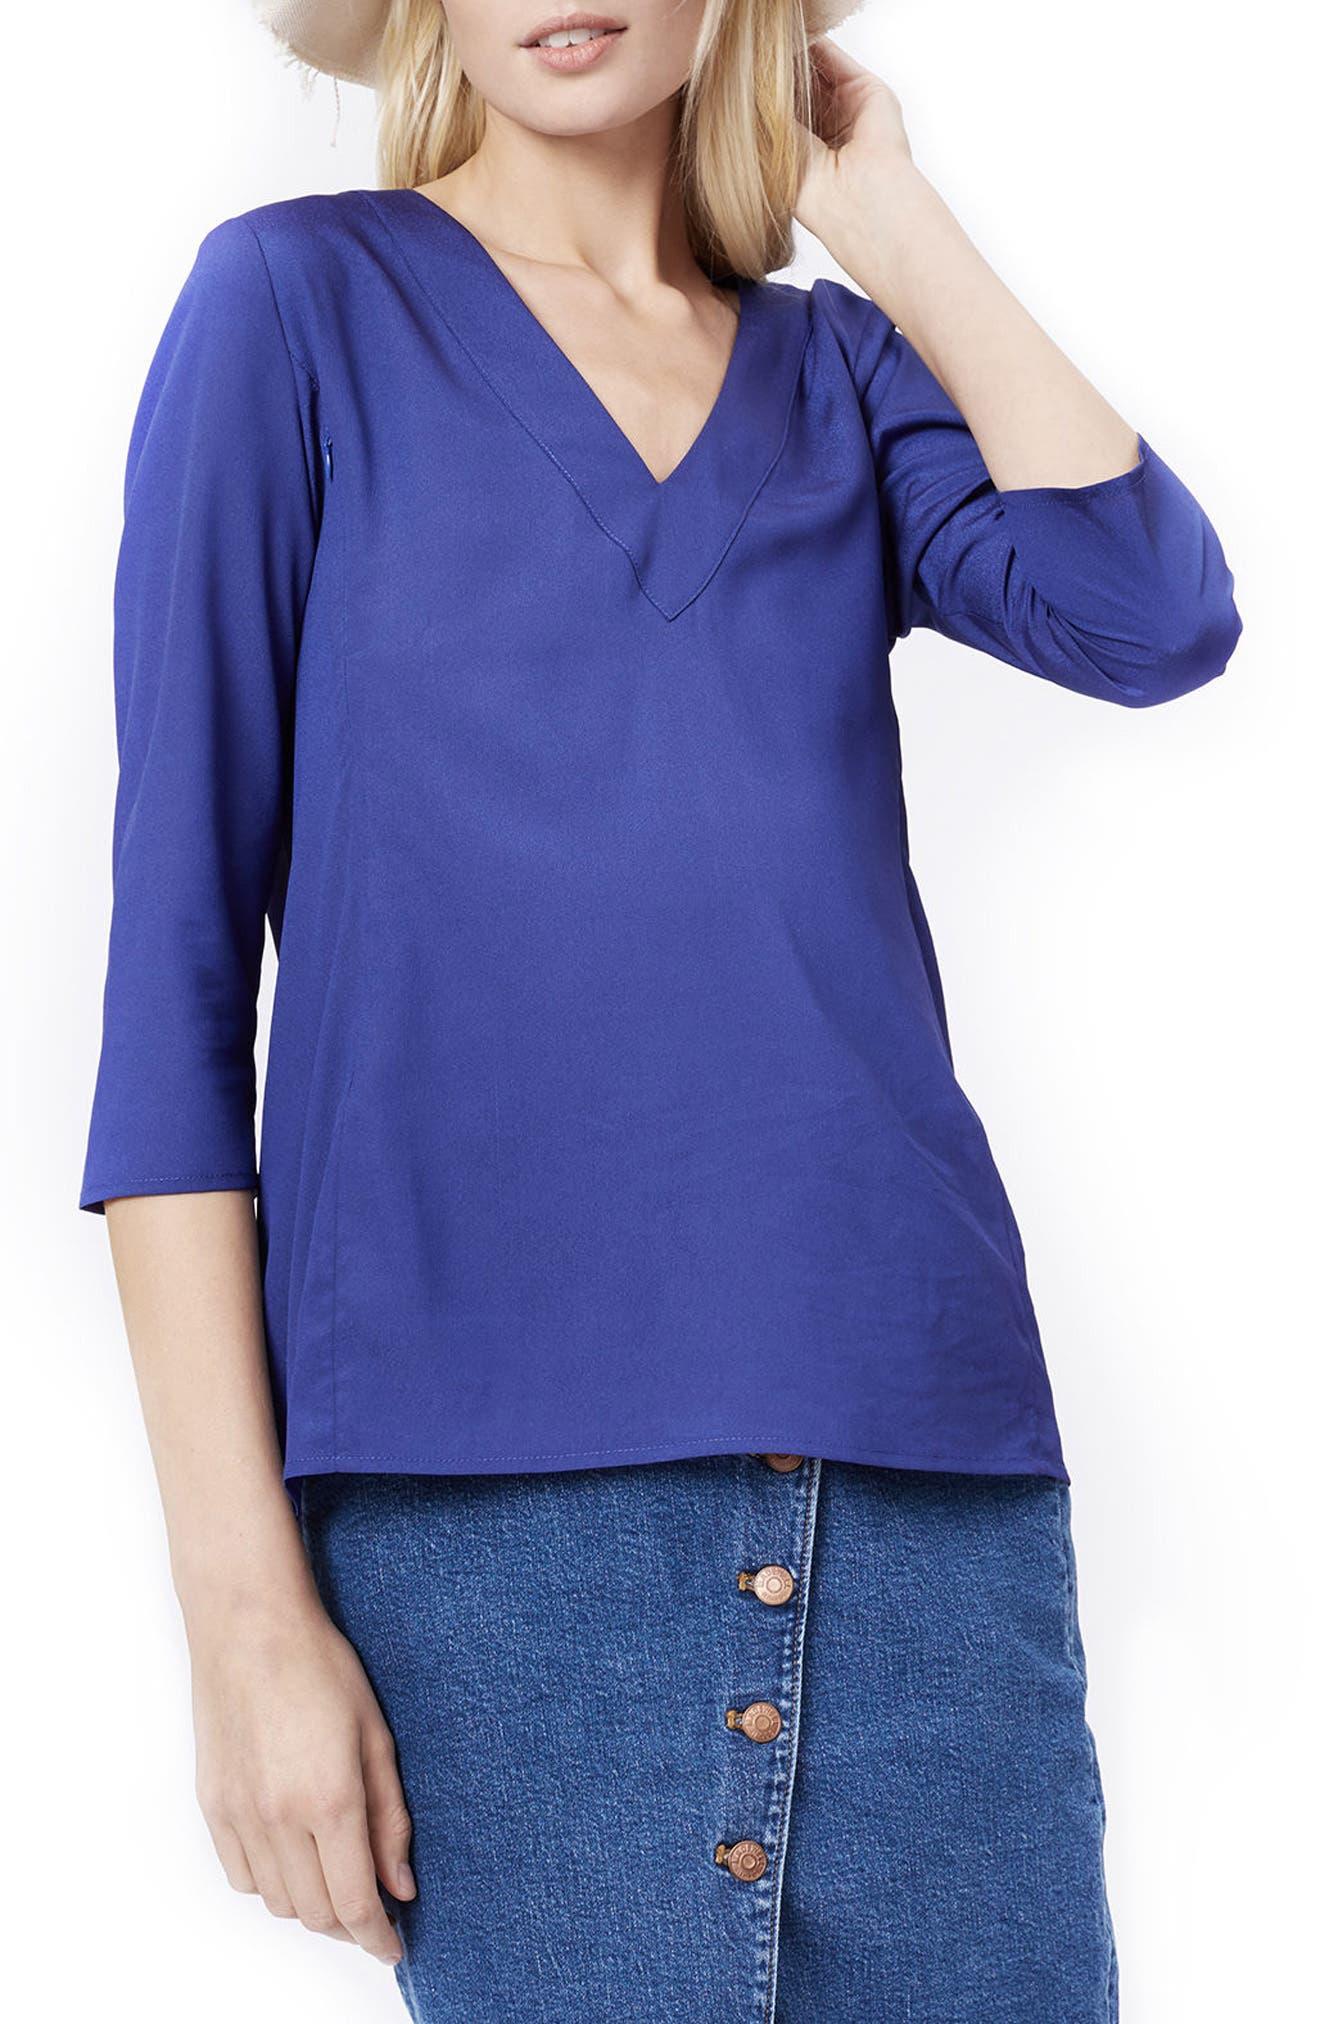 Alice Maternity Blouse,                         Main,                         color, BLUE